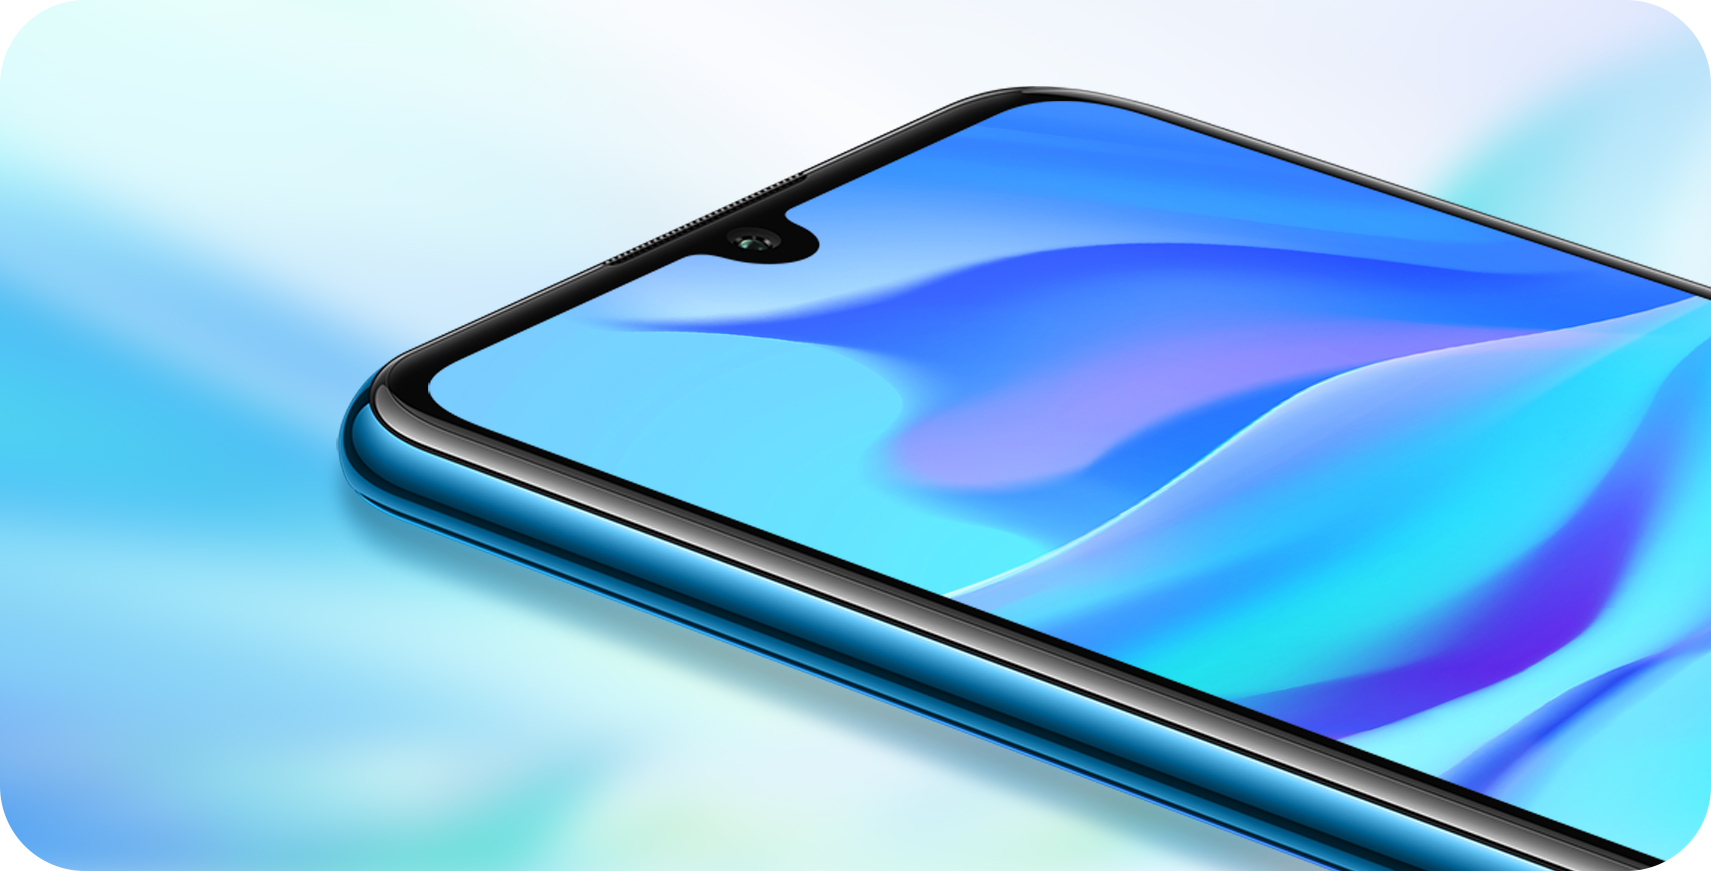 Huawei-Nova-4e-Dewdrop-Display_bg